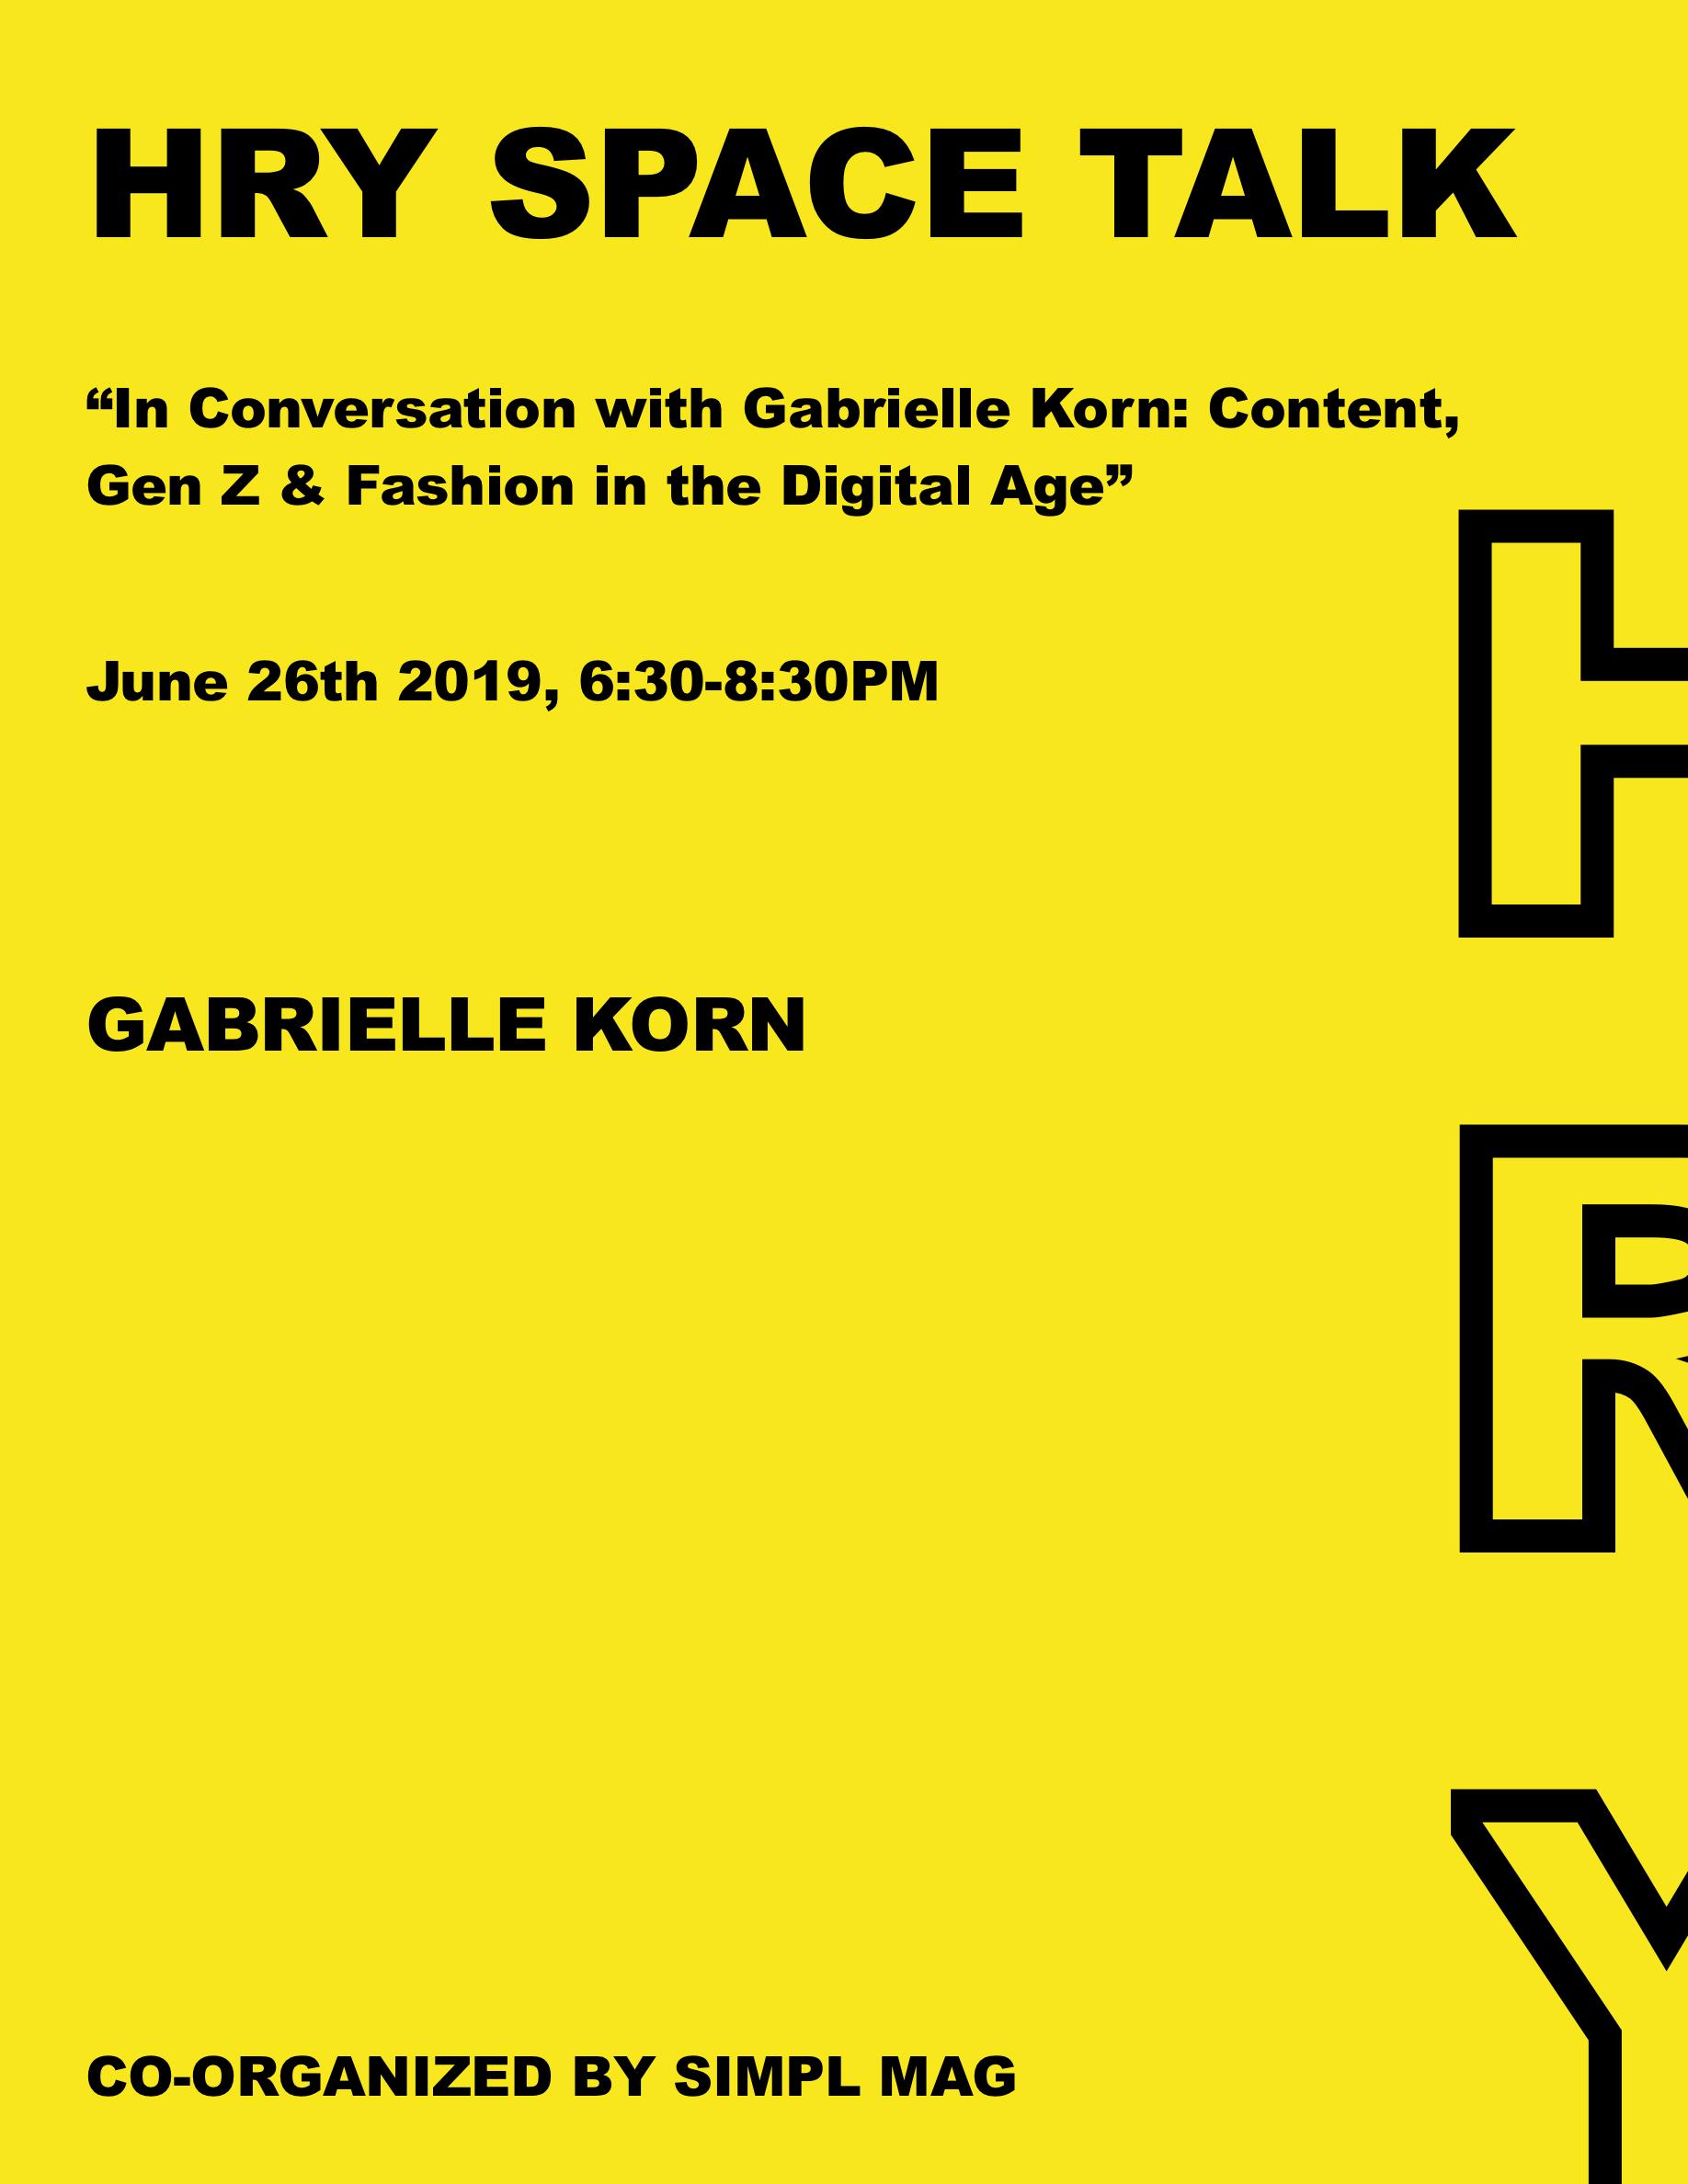 Gabrielle Korn